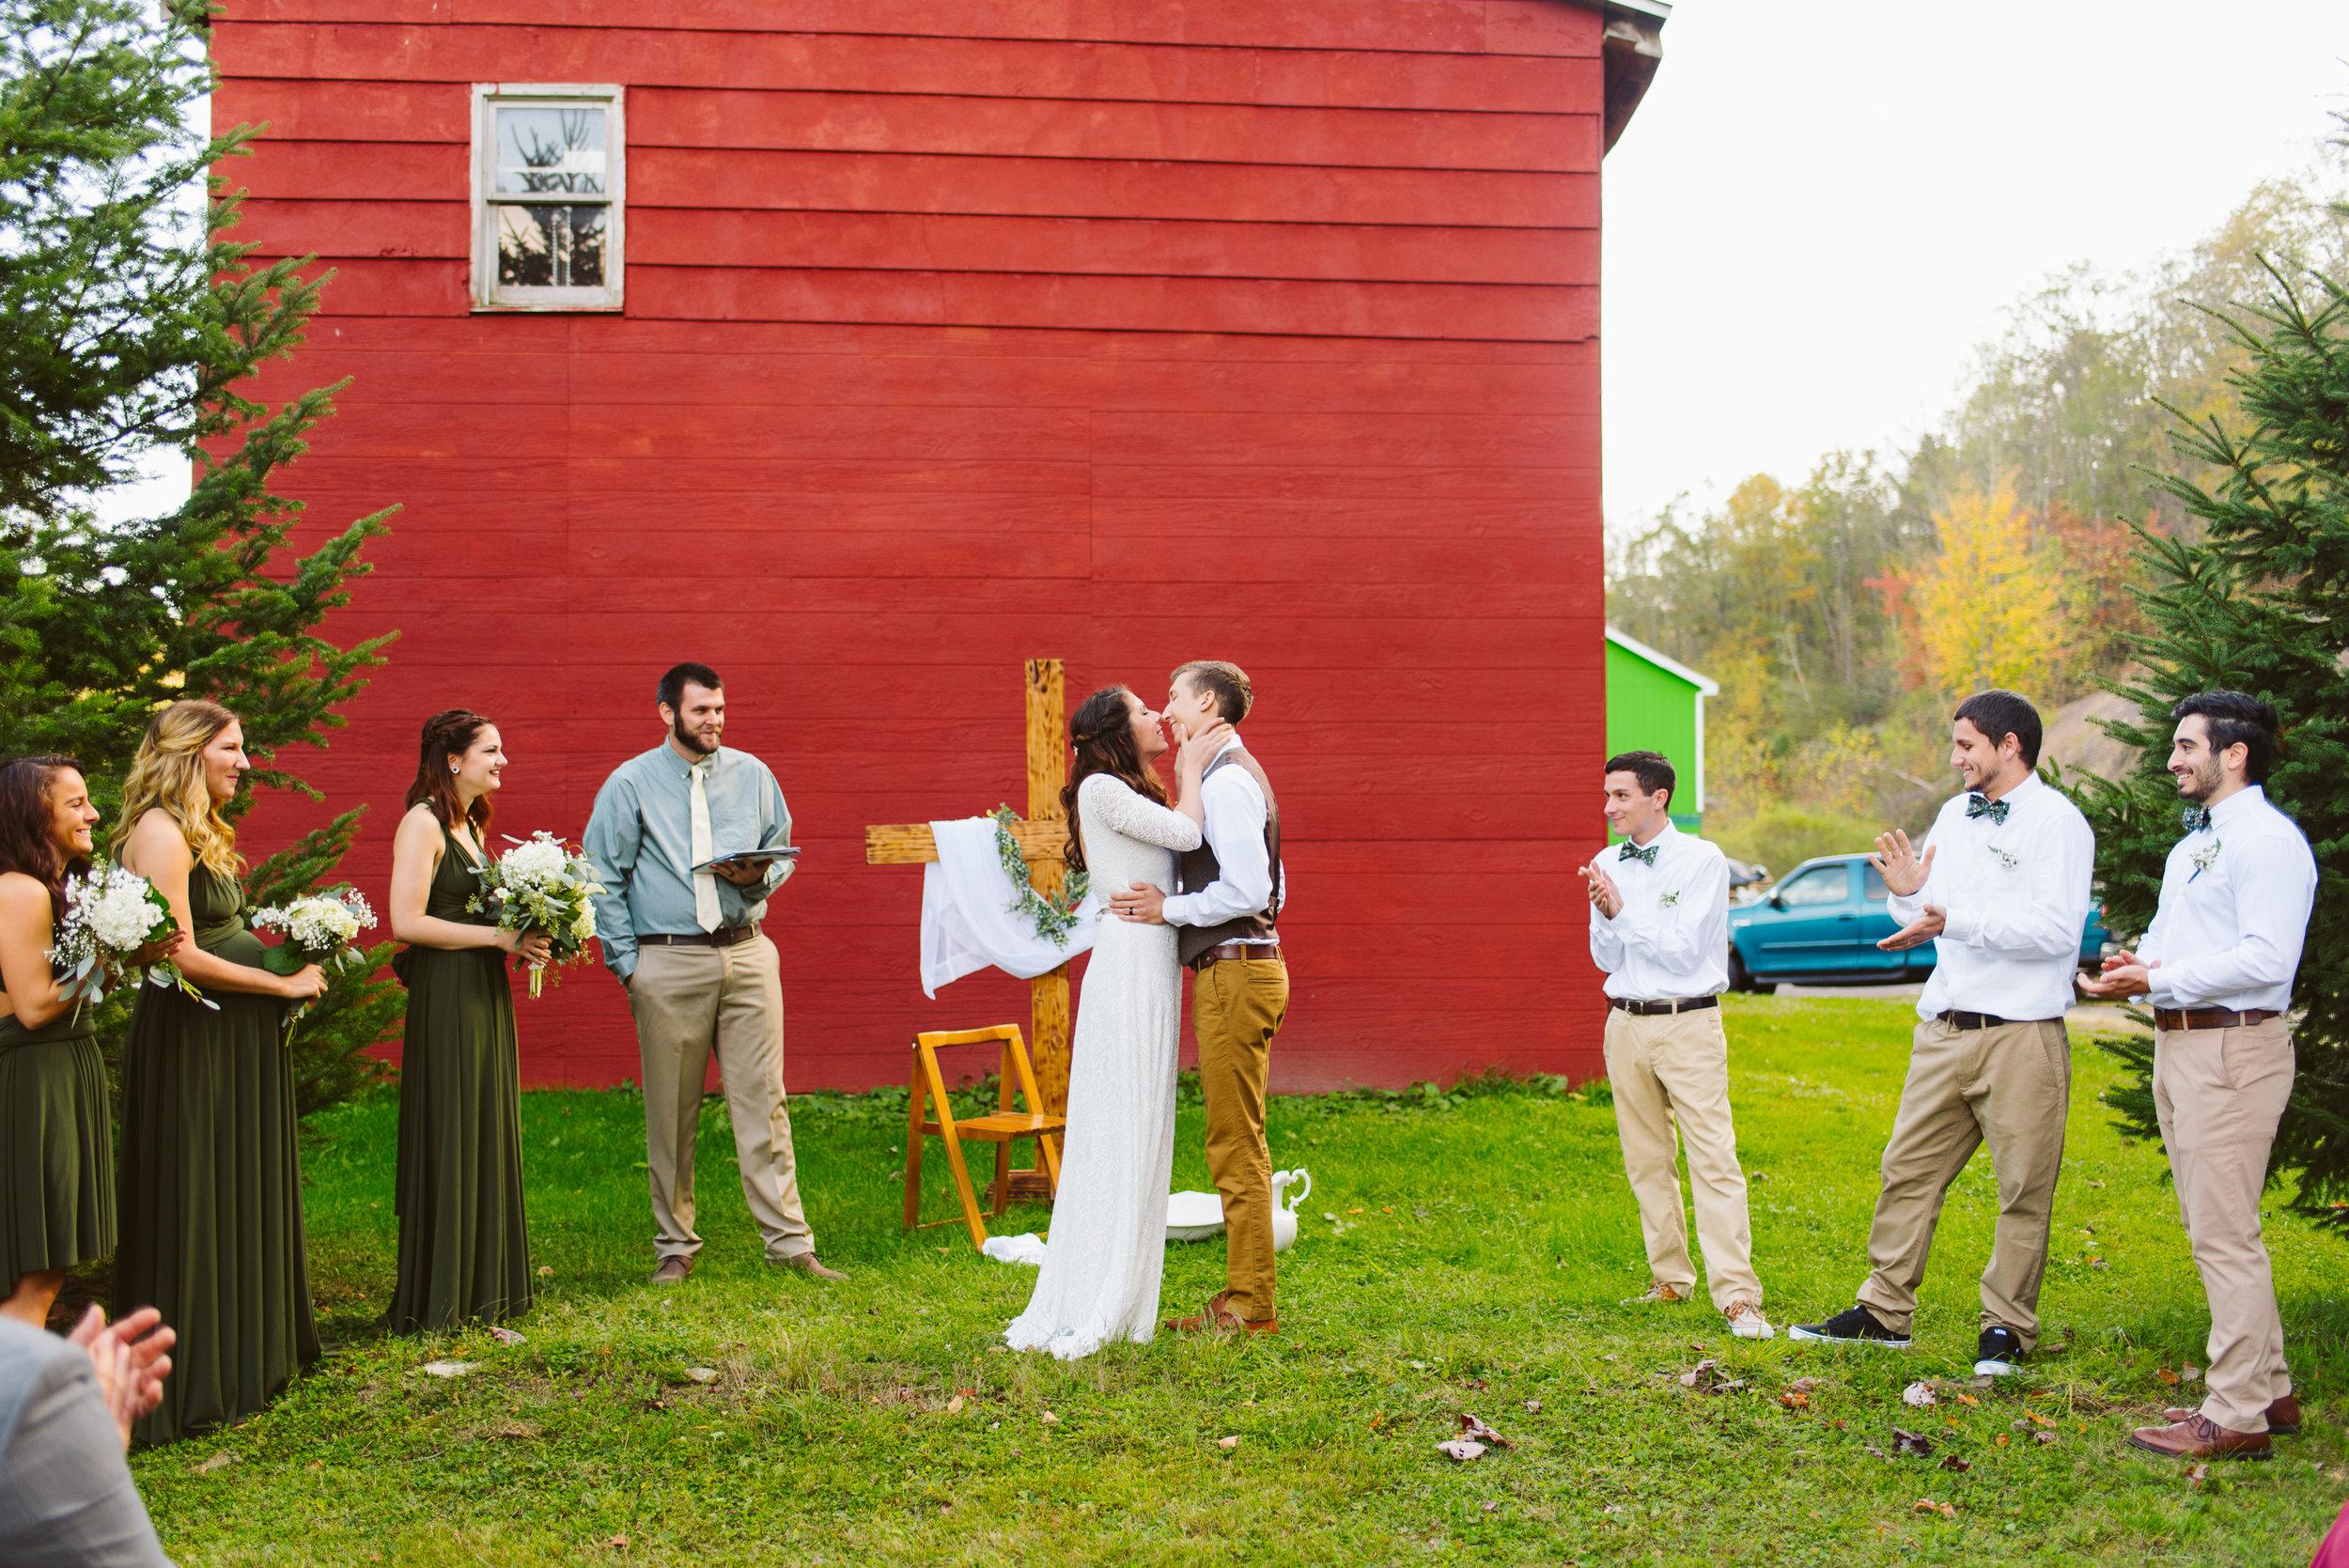 Philadelphia-Wedding-Photographer-Poconos-Pennsylvania-34.jpg